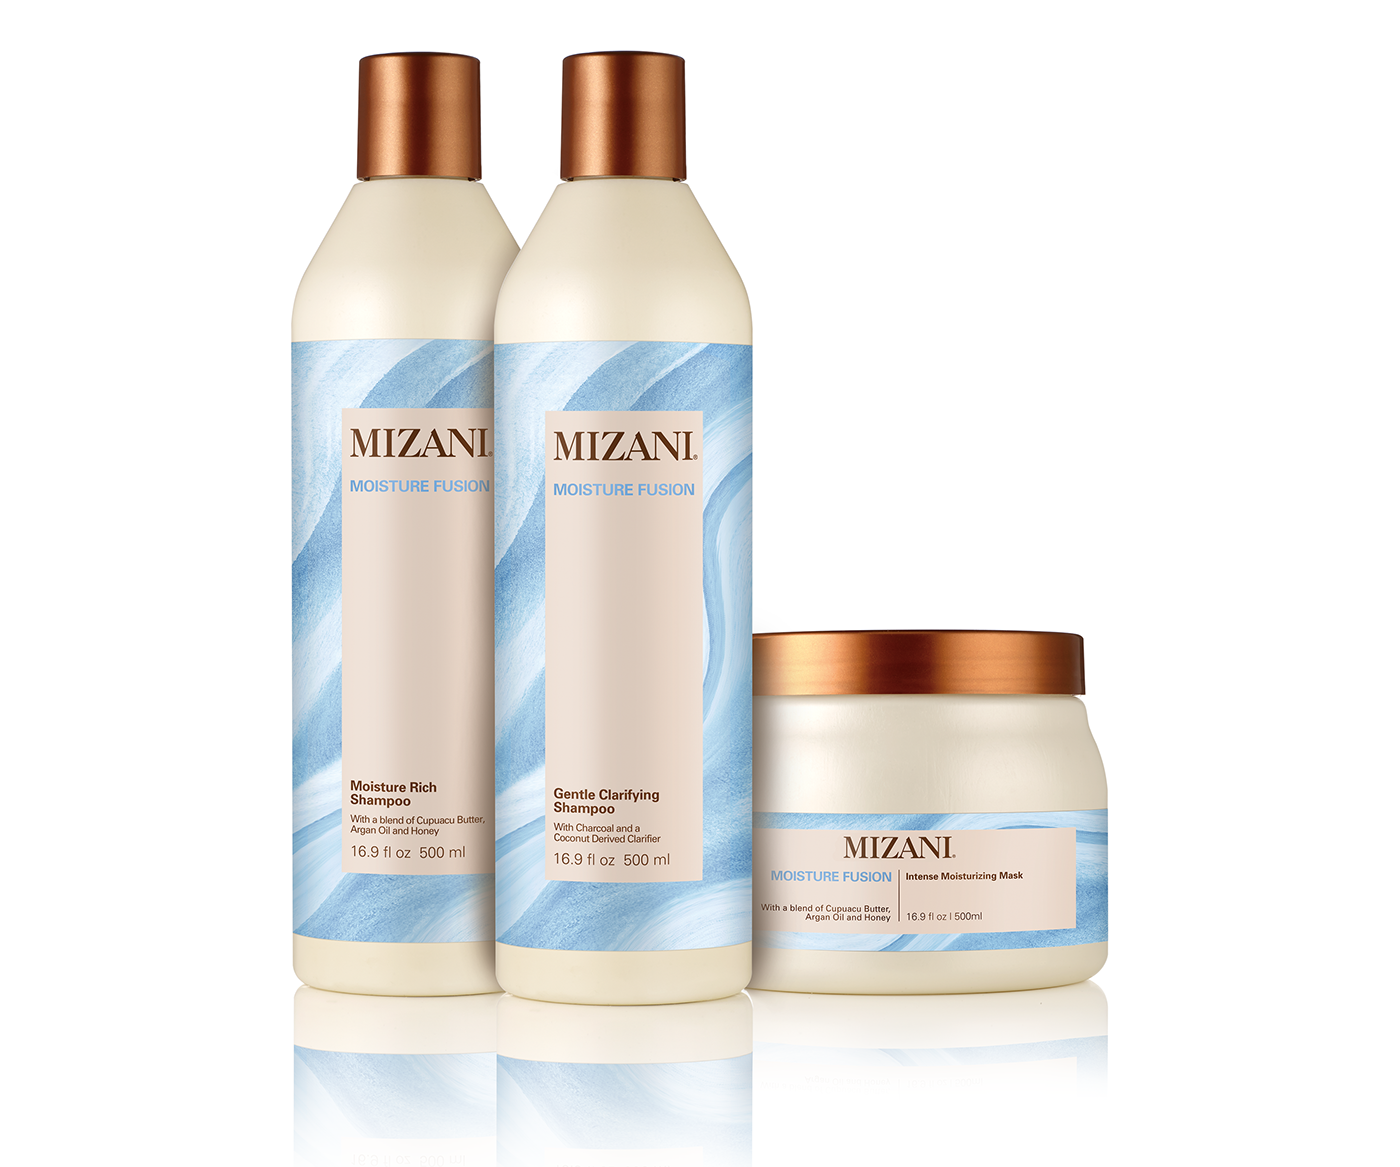 Mizani Moisture Fusion Gentle Shampoo 16.9oz Moisture Rich Shampoo and Mask SET Hair Care & Styling